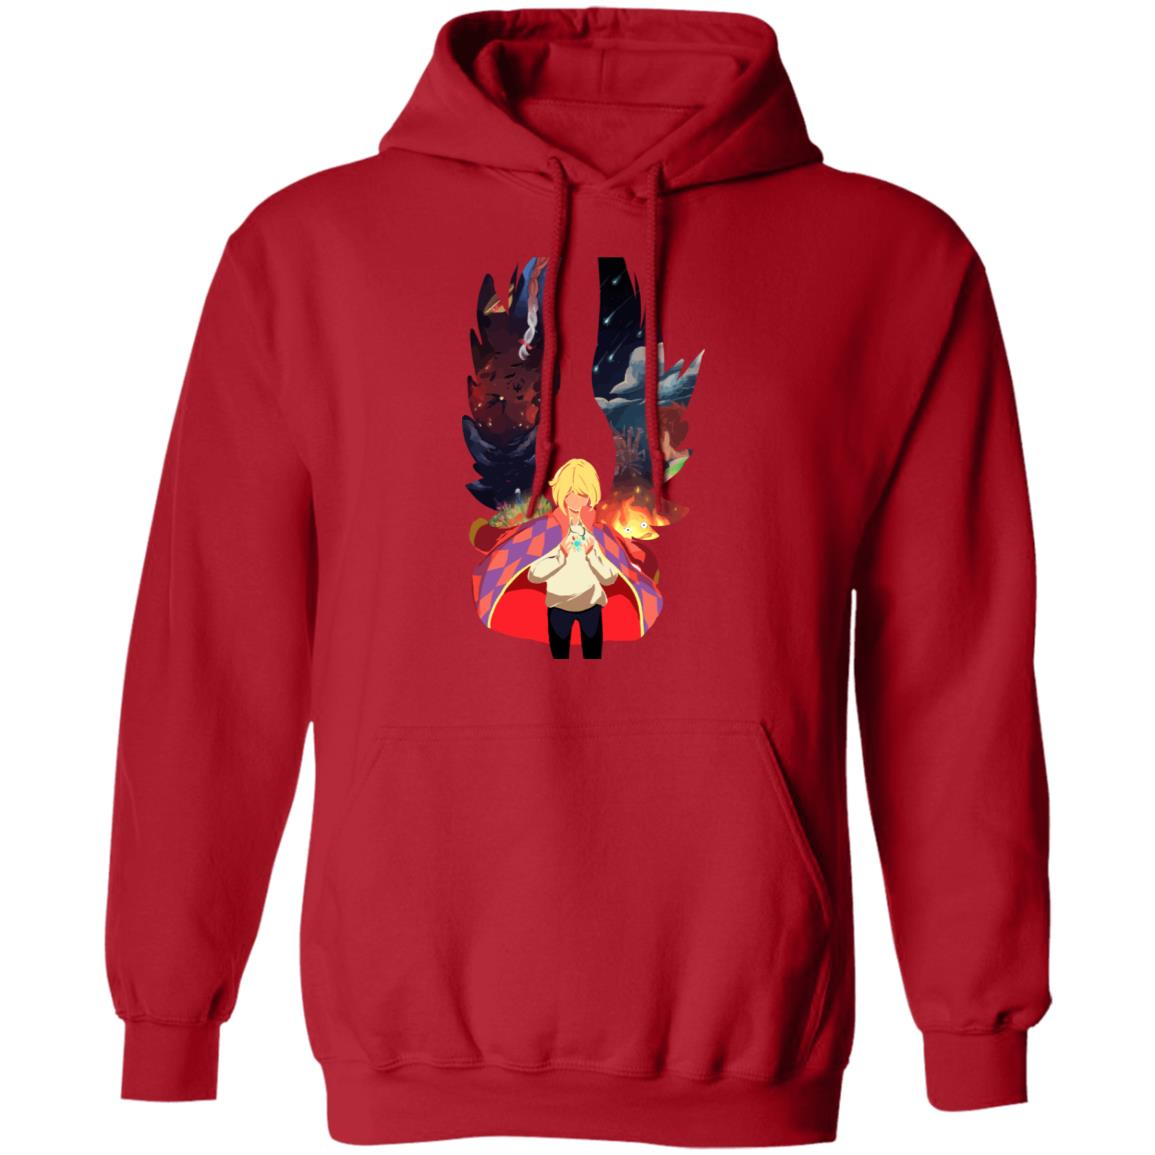 Howl and Colorful Wings Hoodie